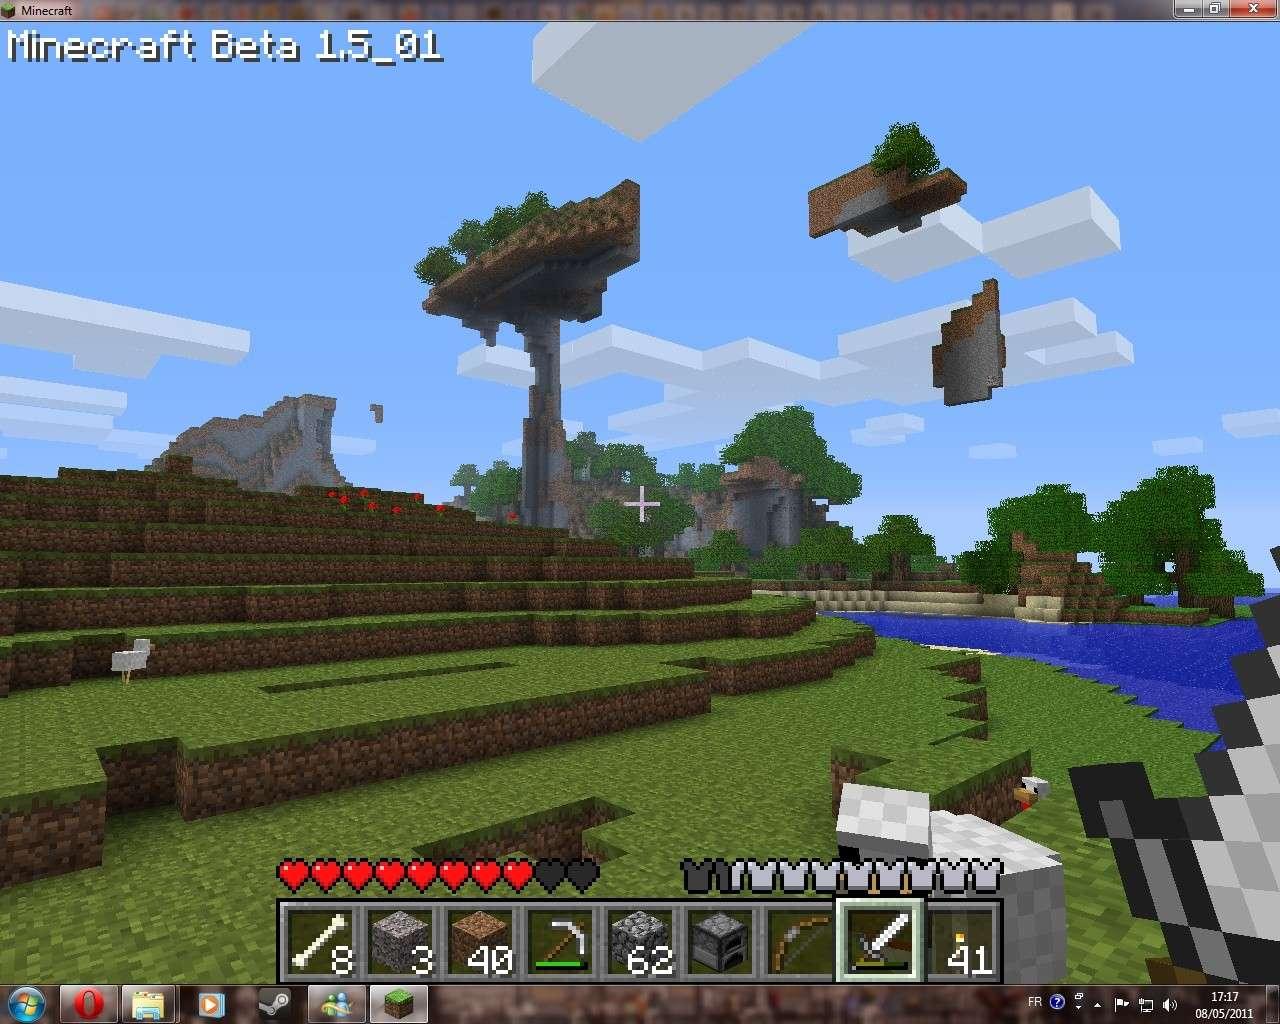 [Minecraft] Mon chez moi (moi moi chez moi moi moiiiii) - Page 6 New_bi21